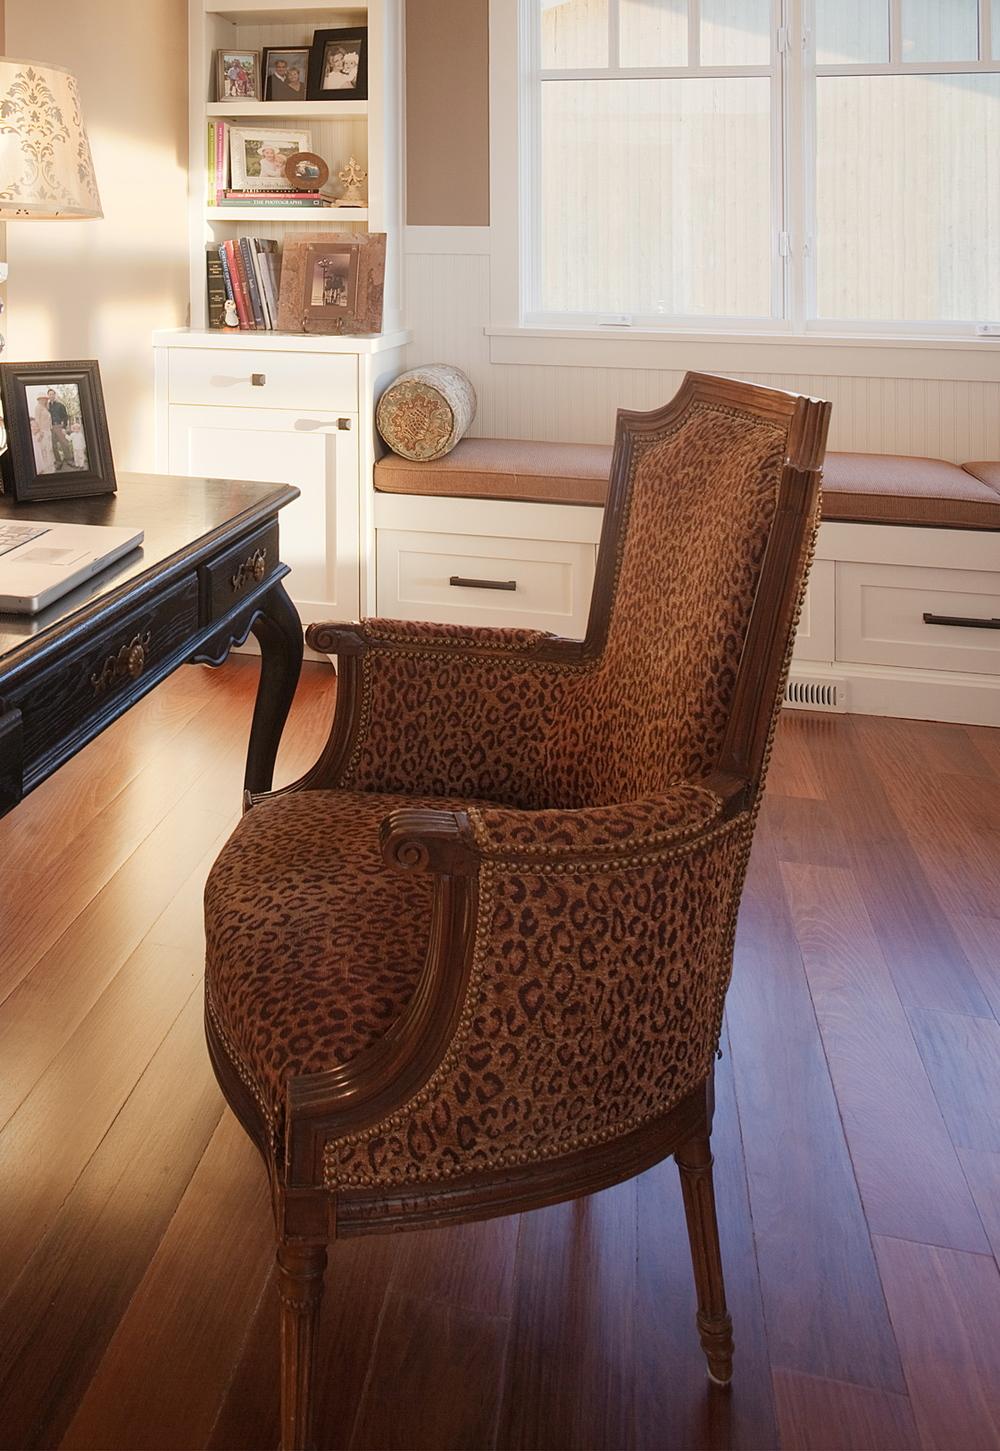 Vintage Leopard Print - Kristi Spouse interiors